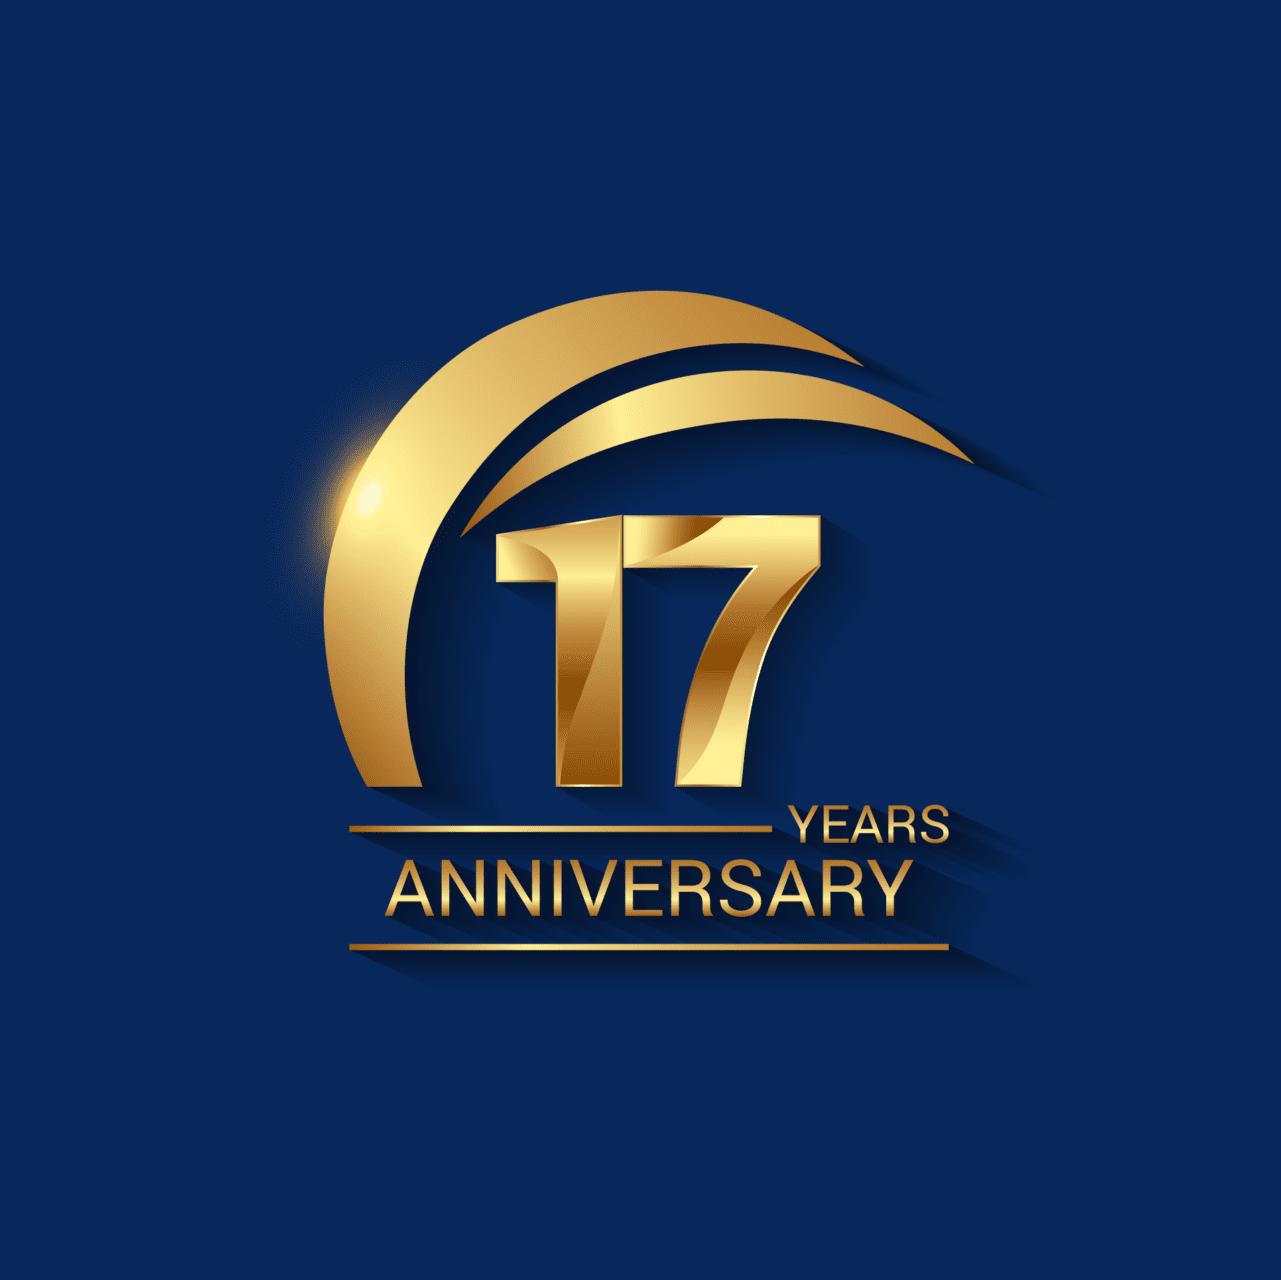 17 Years Anniversary Celebration Logotype. Golden Elegant Vector Illustration with Gold Swoosh